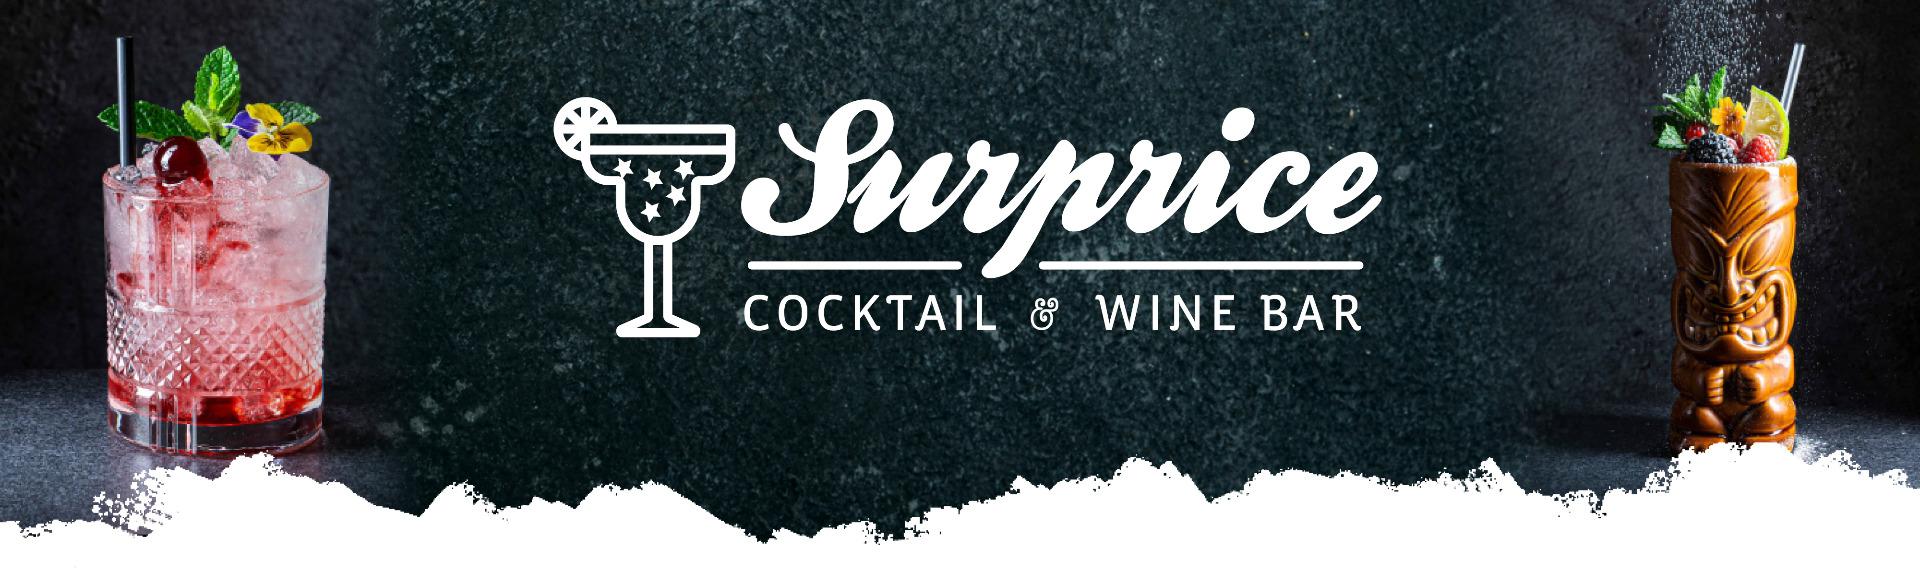 Surprice Cocktail & Wine Bar